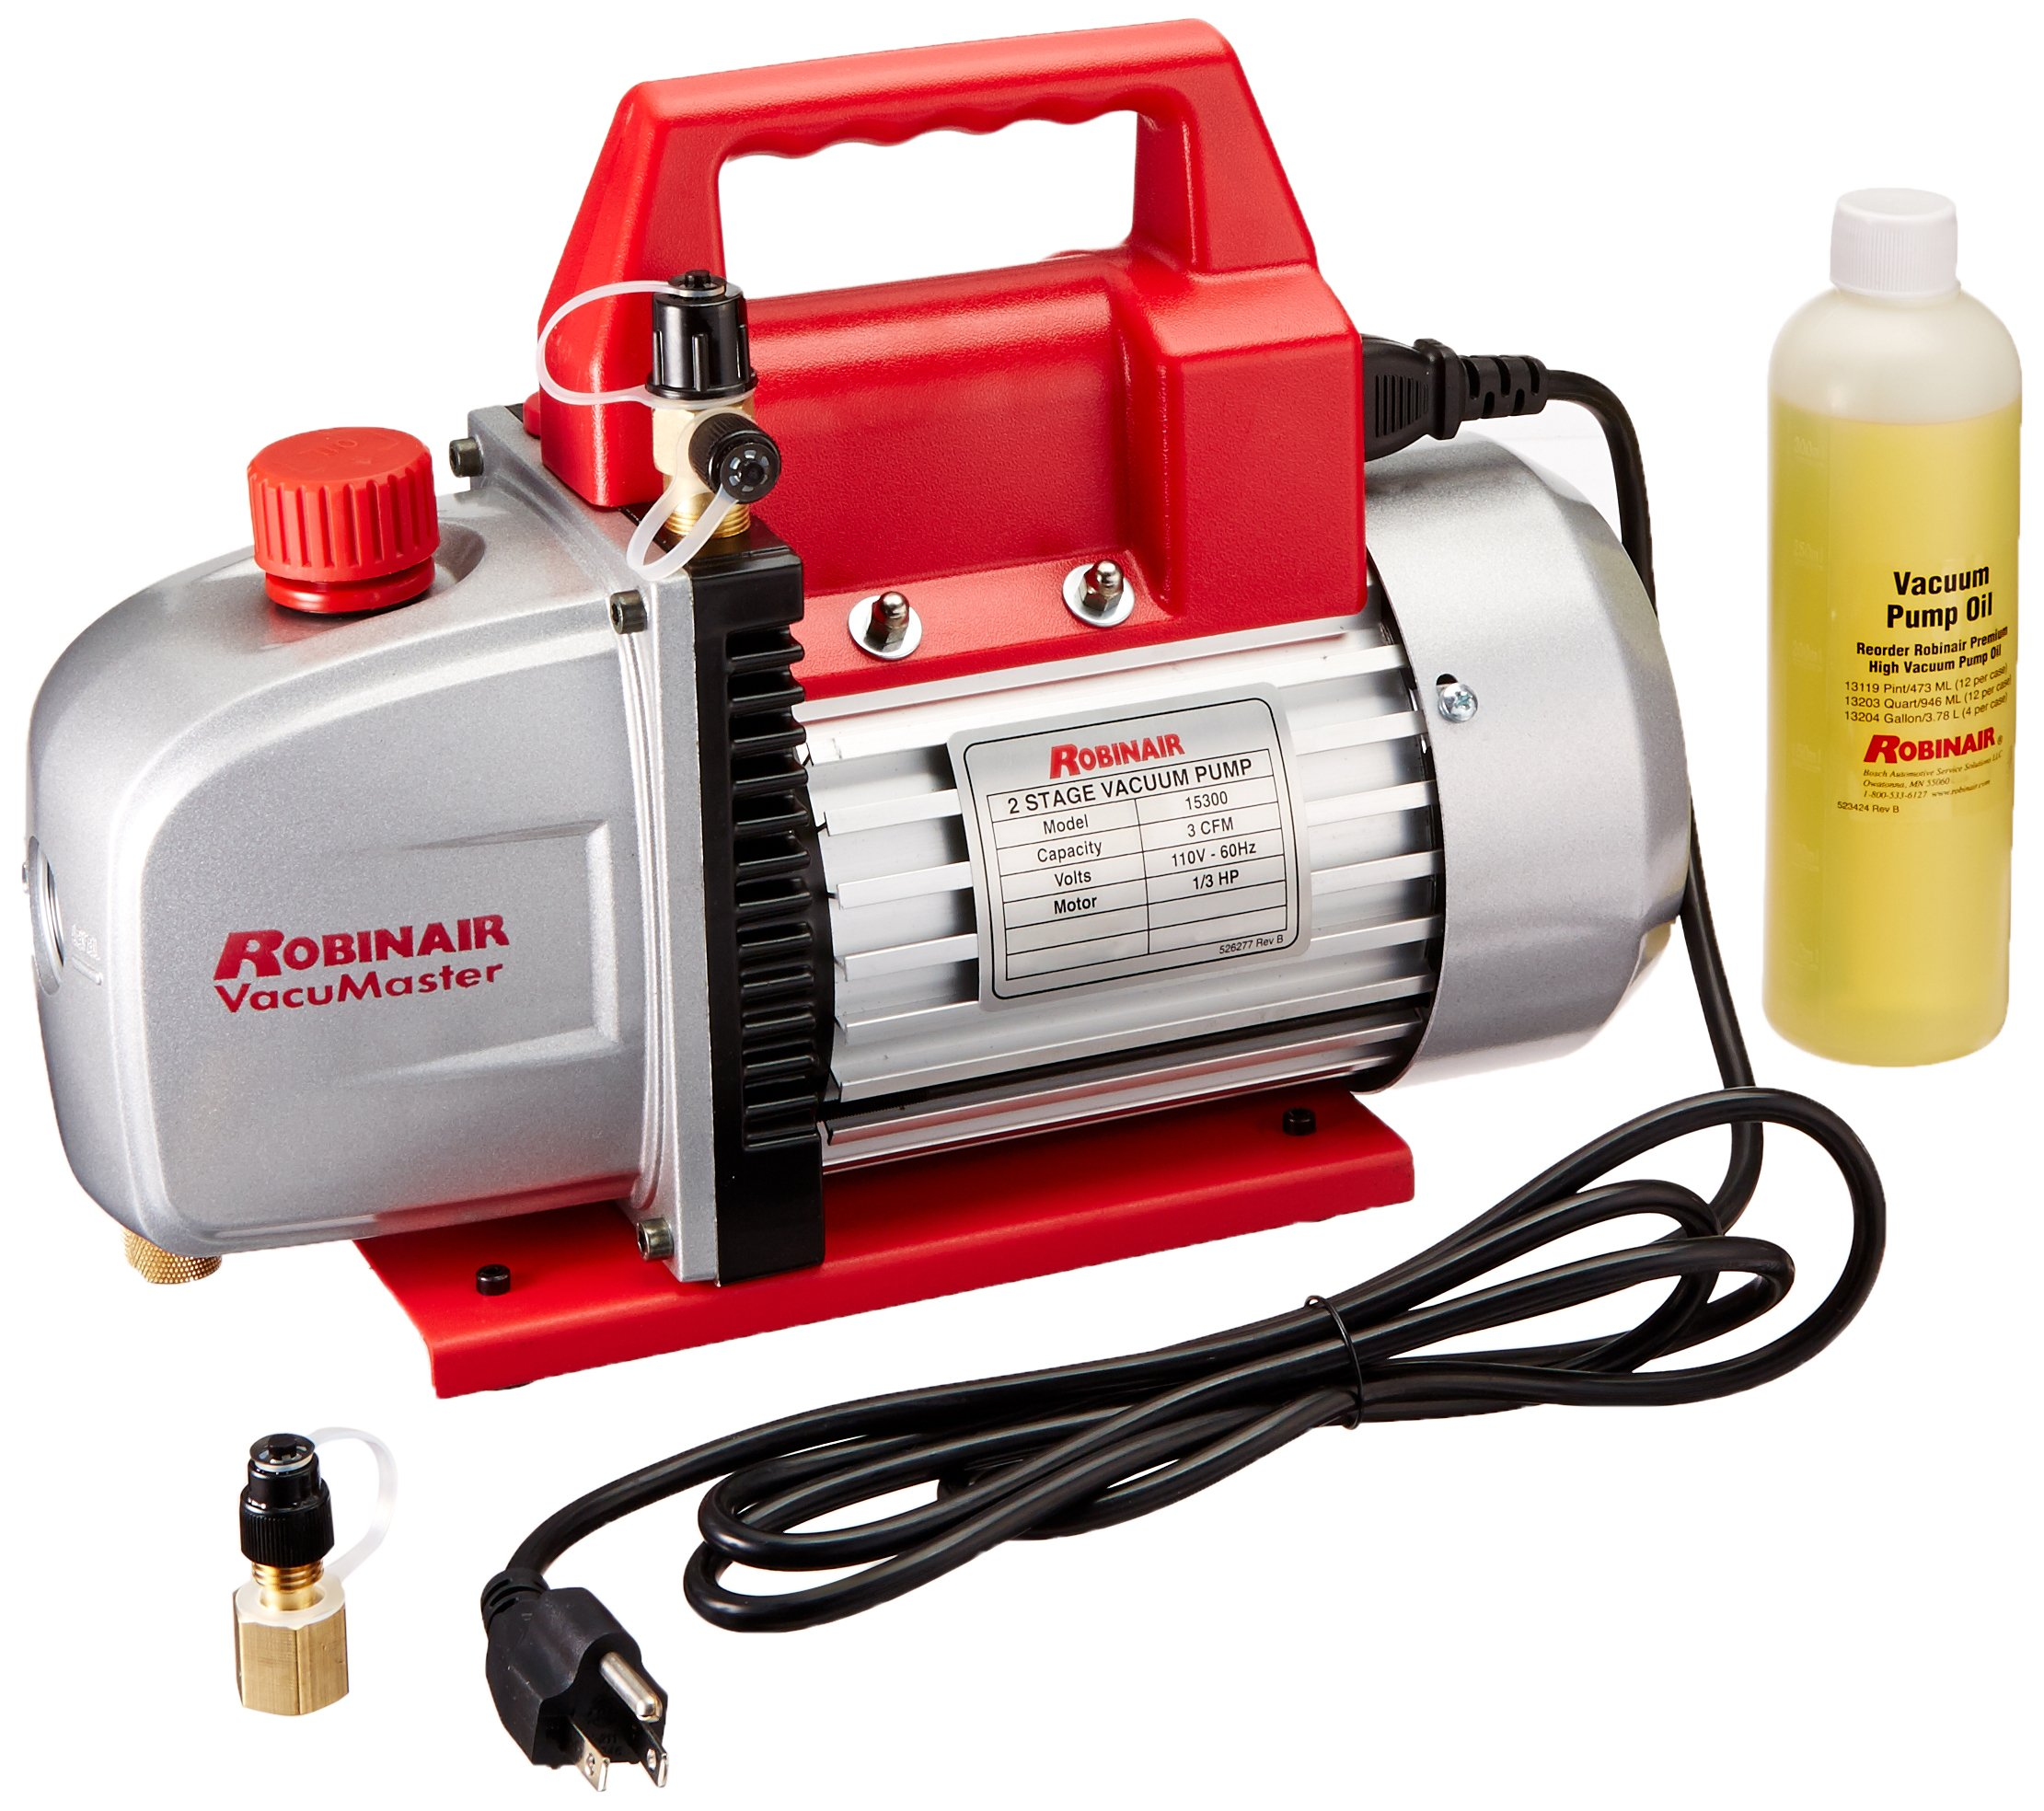 NewYall Electrical Vac Vacuum Pump